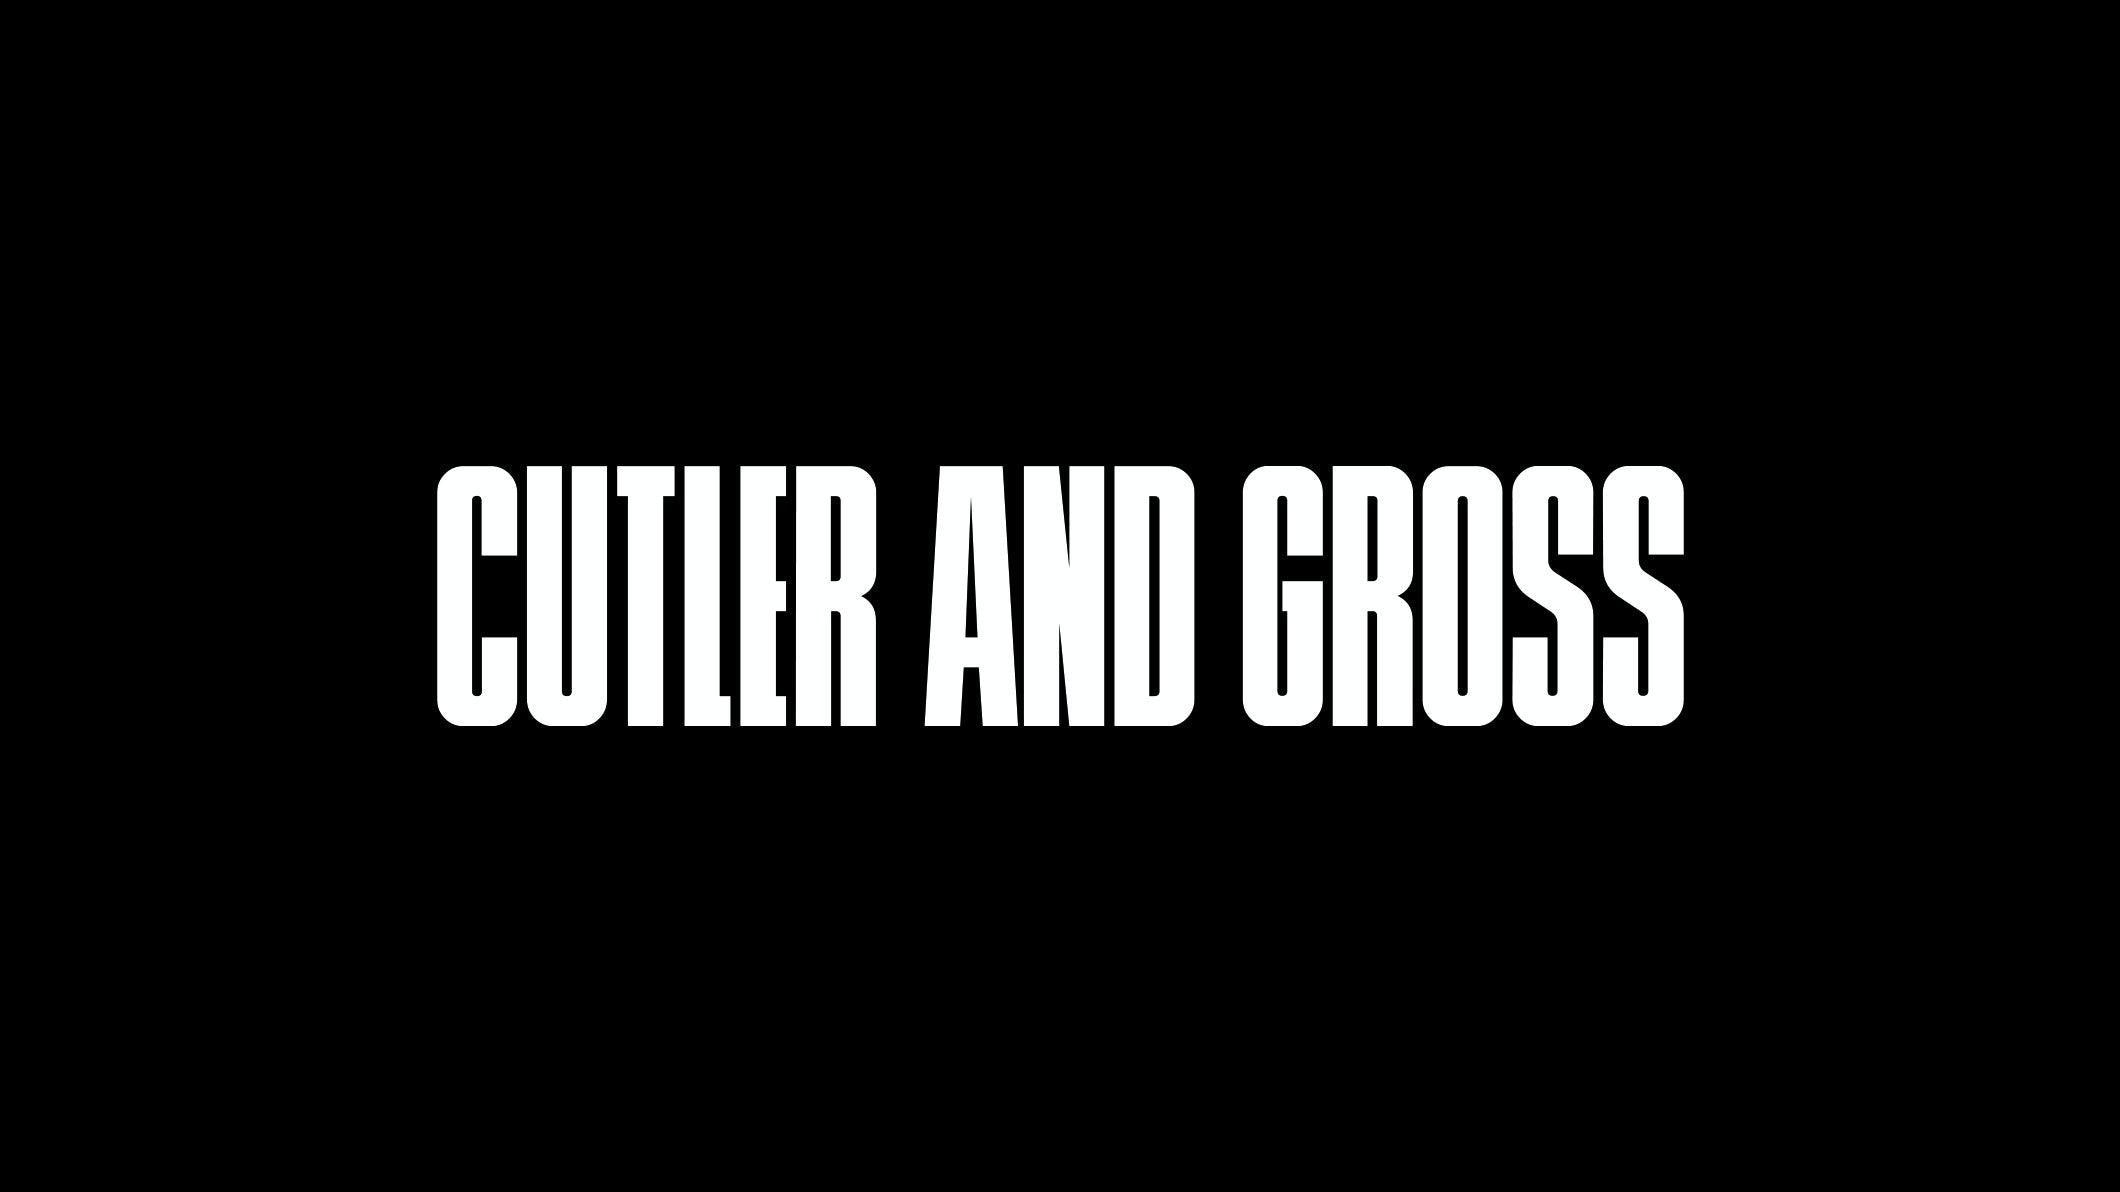 Cutler and Gross company logo